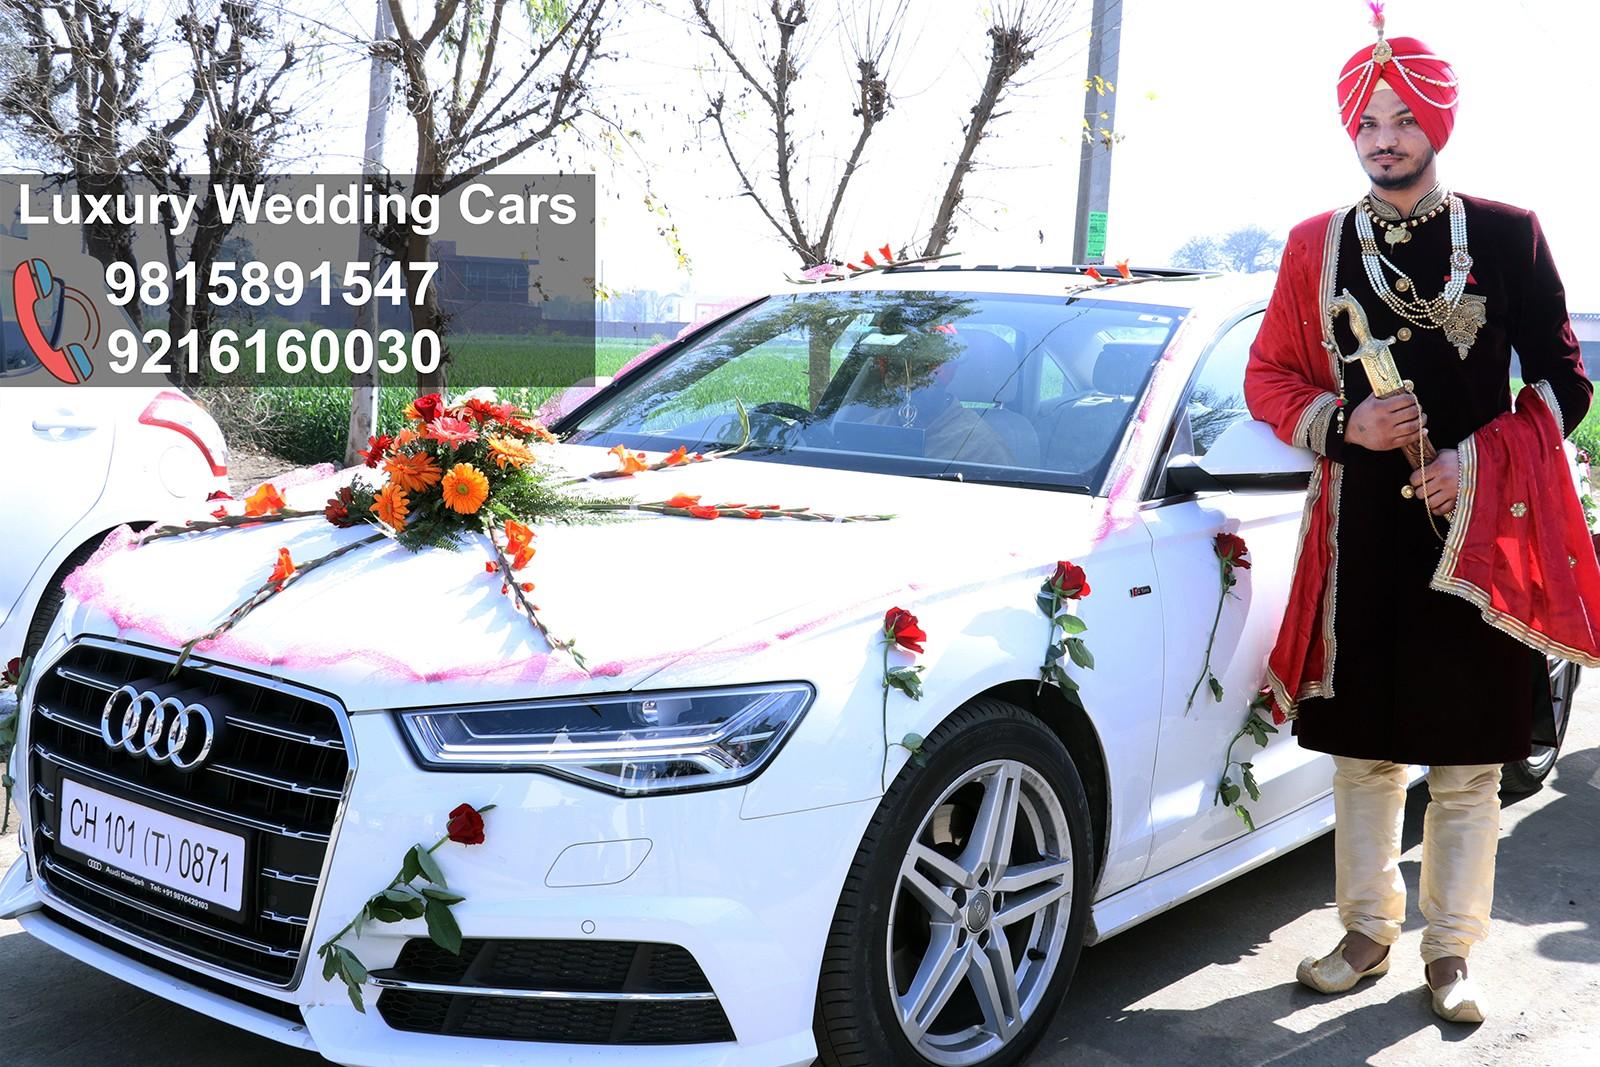 Luxury Car For Wedding In Mohali Wedding Luxury Car In Mohali City